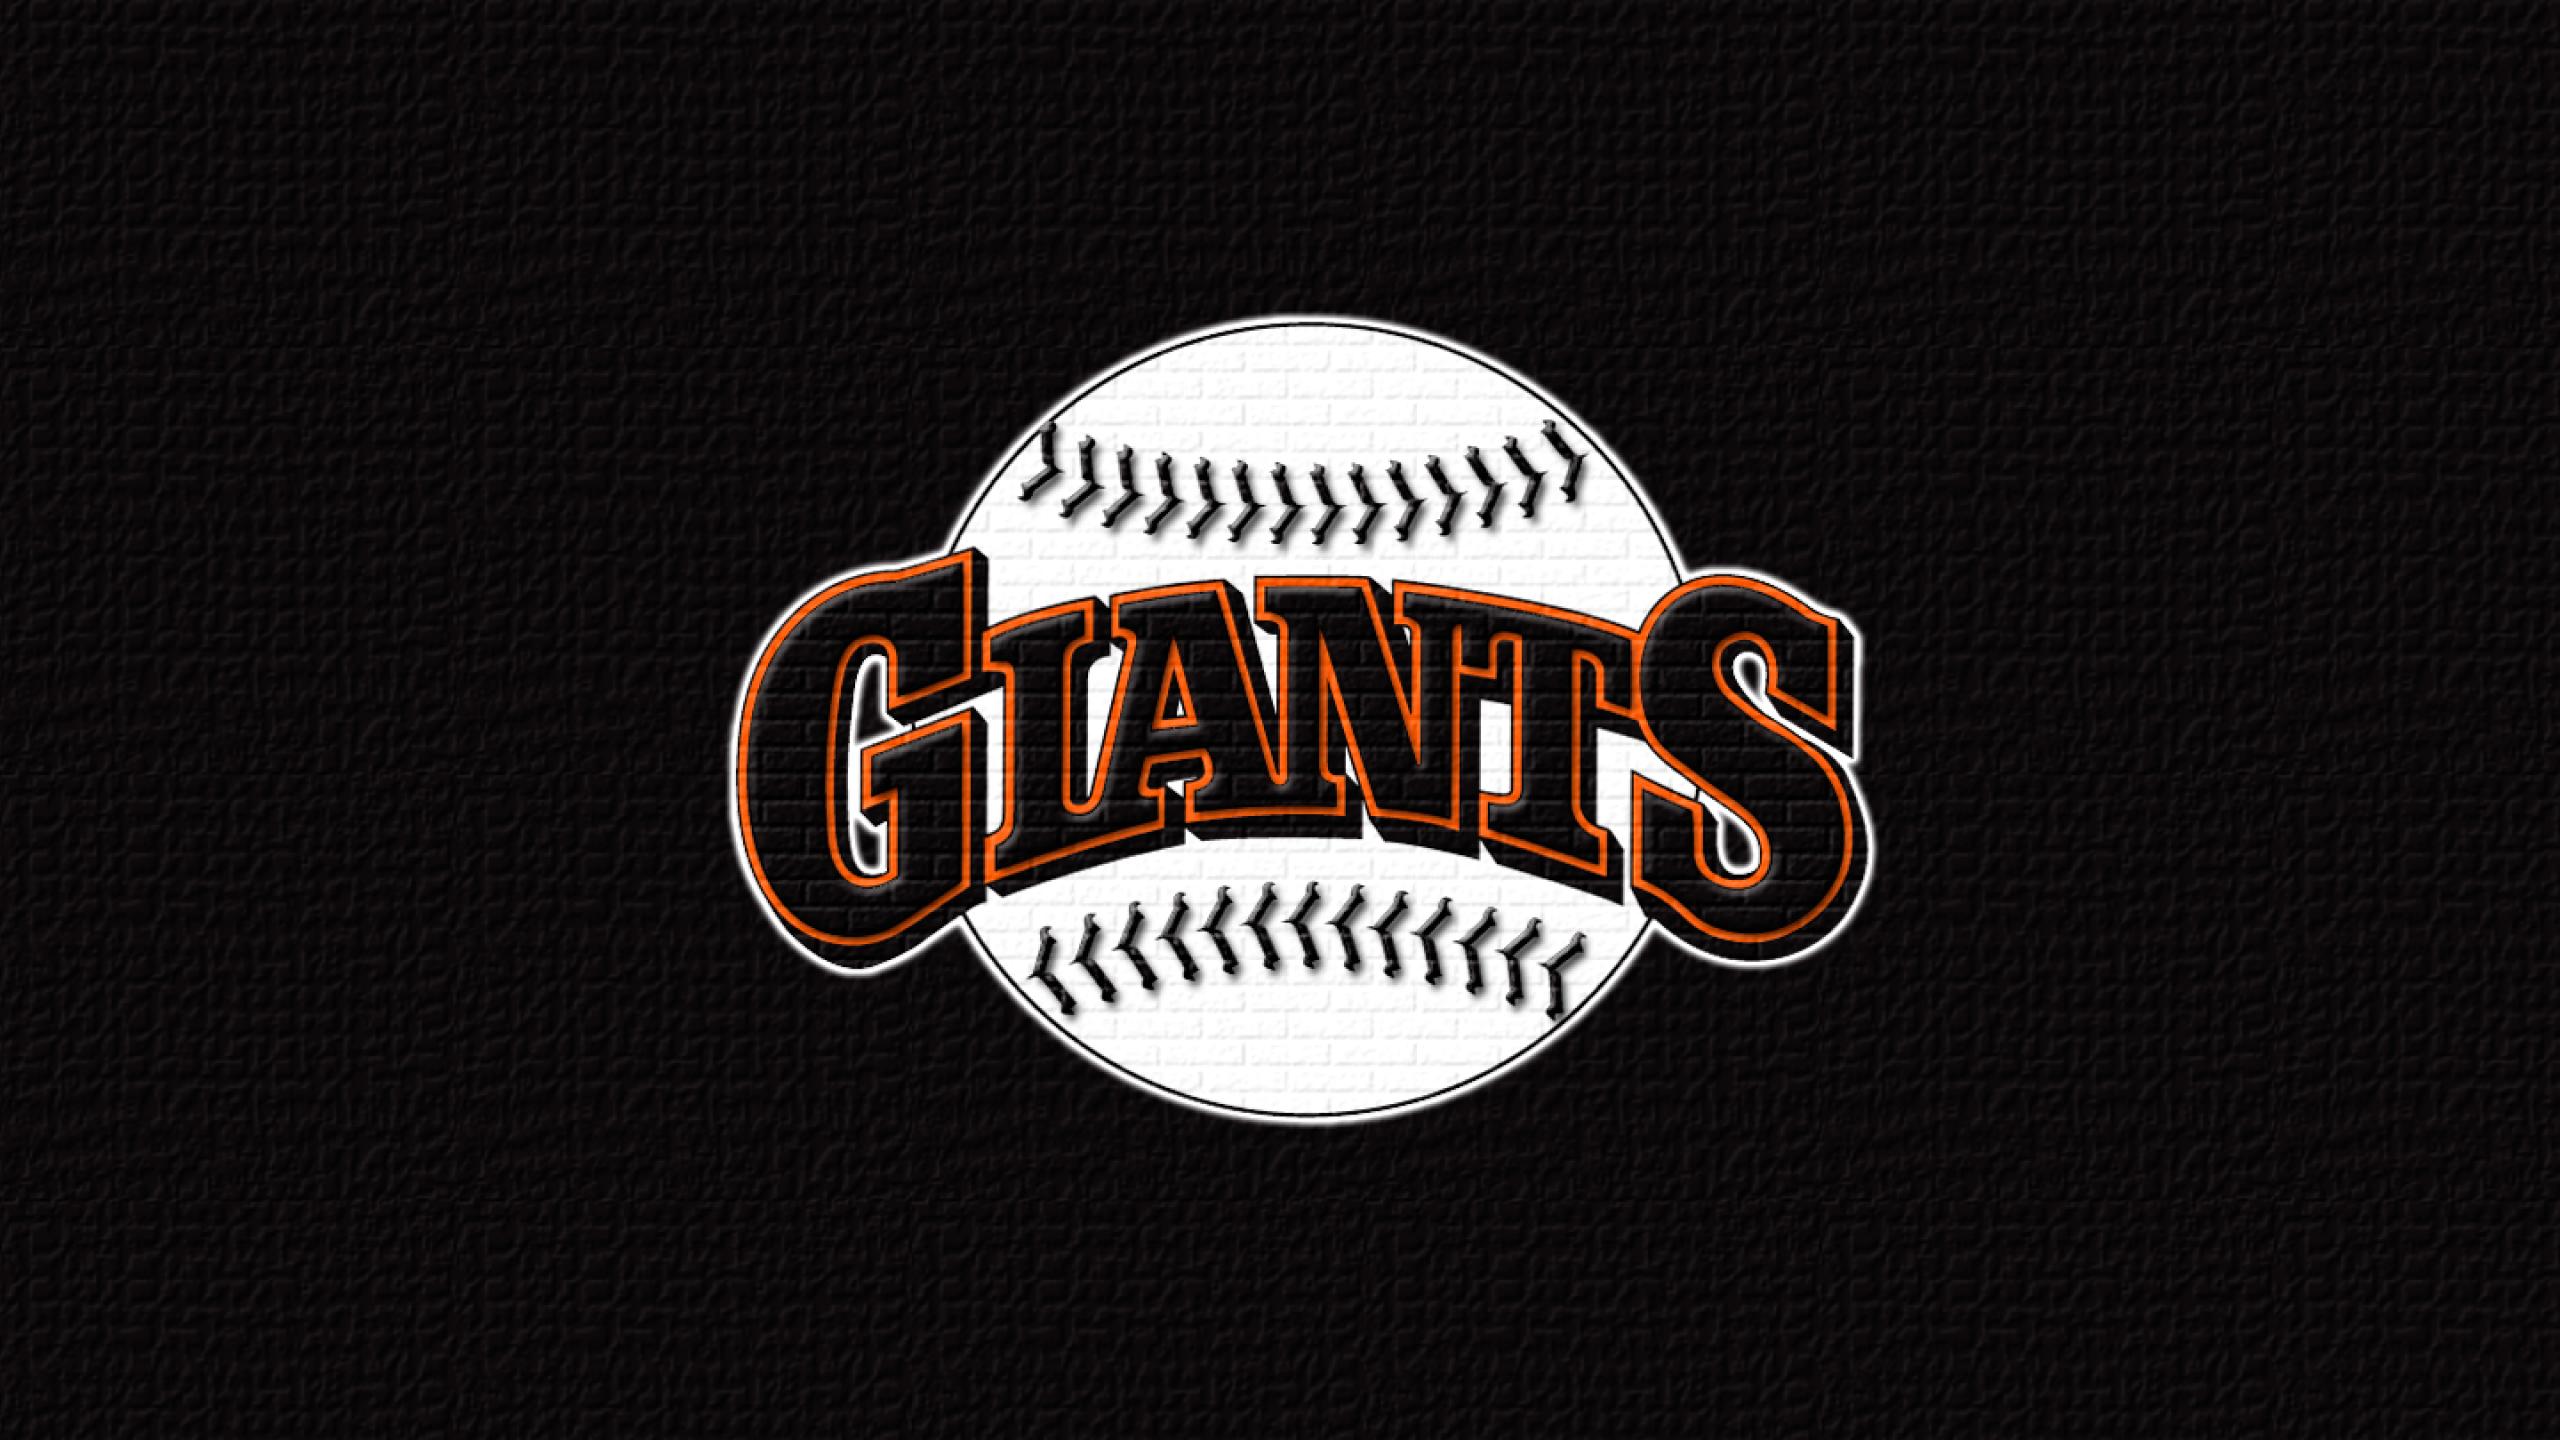 San Francisco Giants Wallpaper 1920x1200 Beautiful Pics 2560x1440